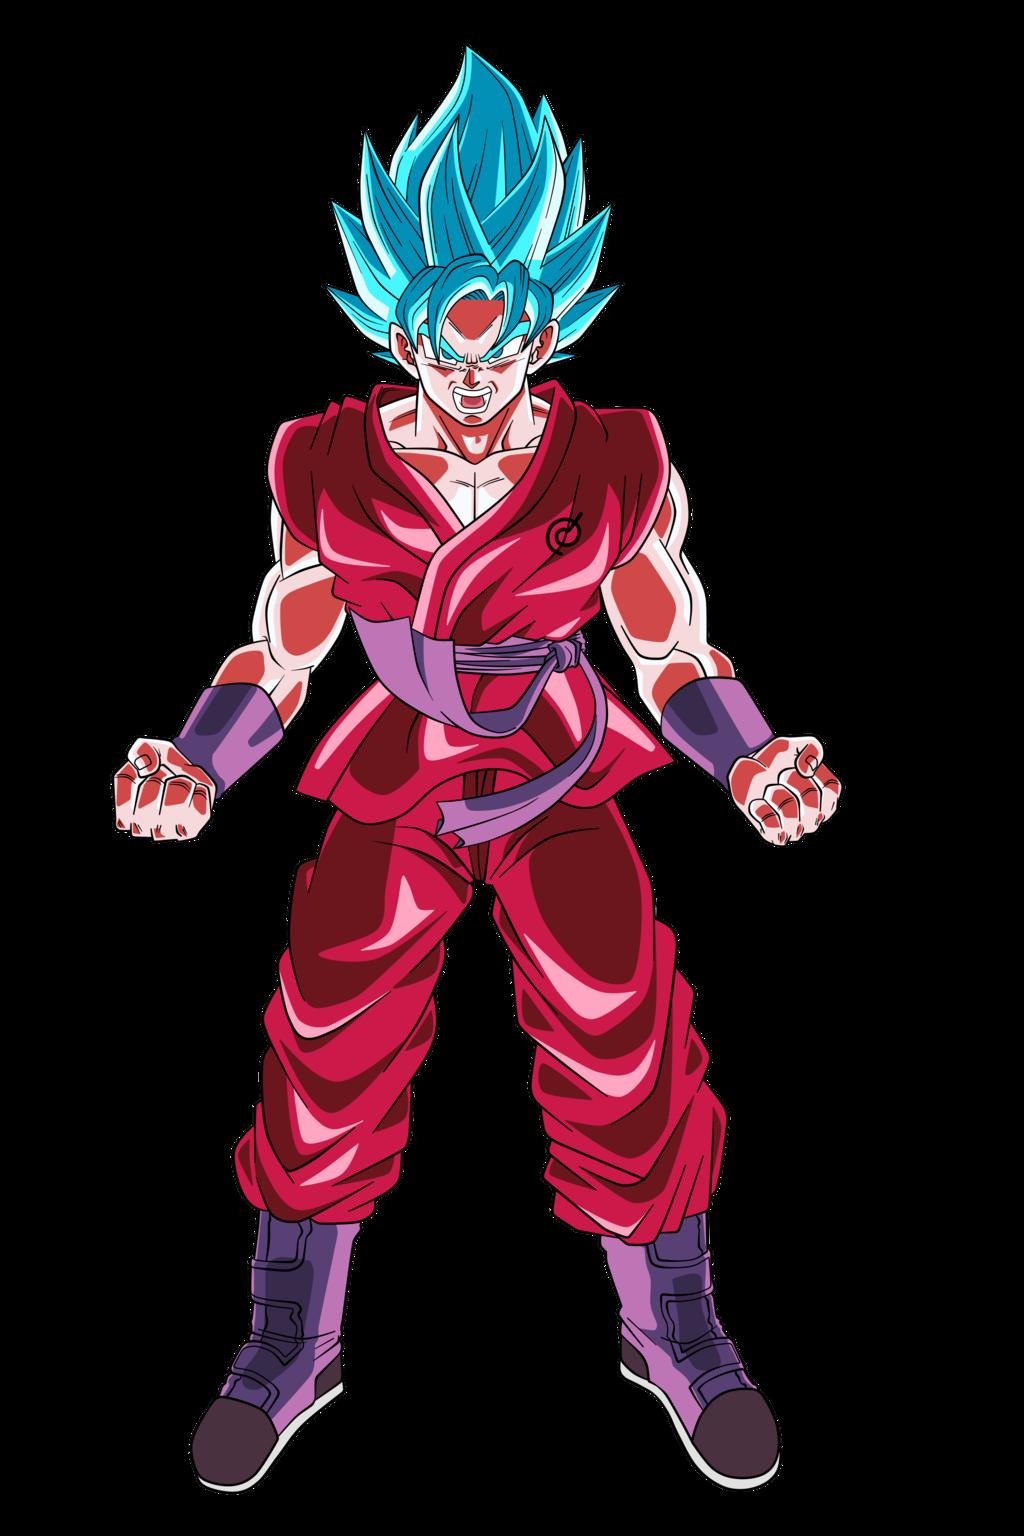 Goku Ssj Blue Png Buscar Con Google Kaioken X10 Personajes De Goku Fotos Goku